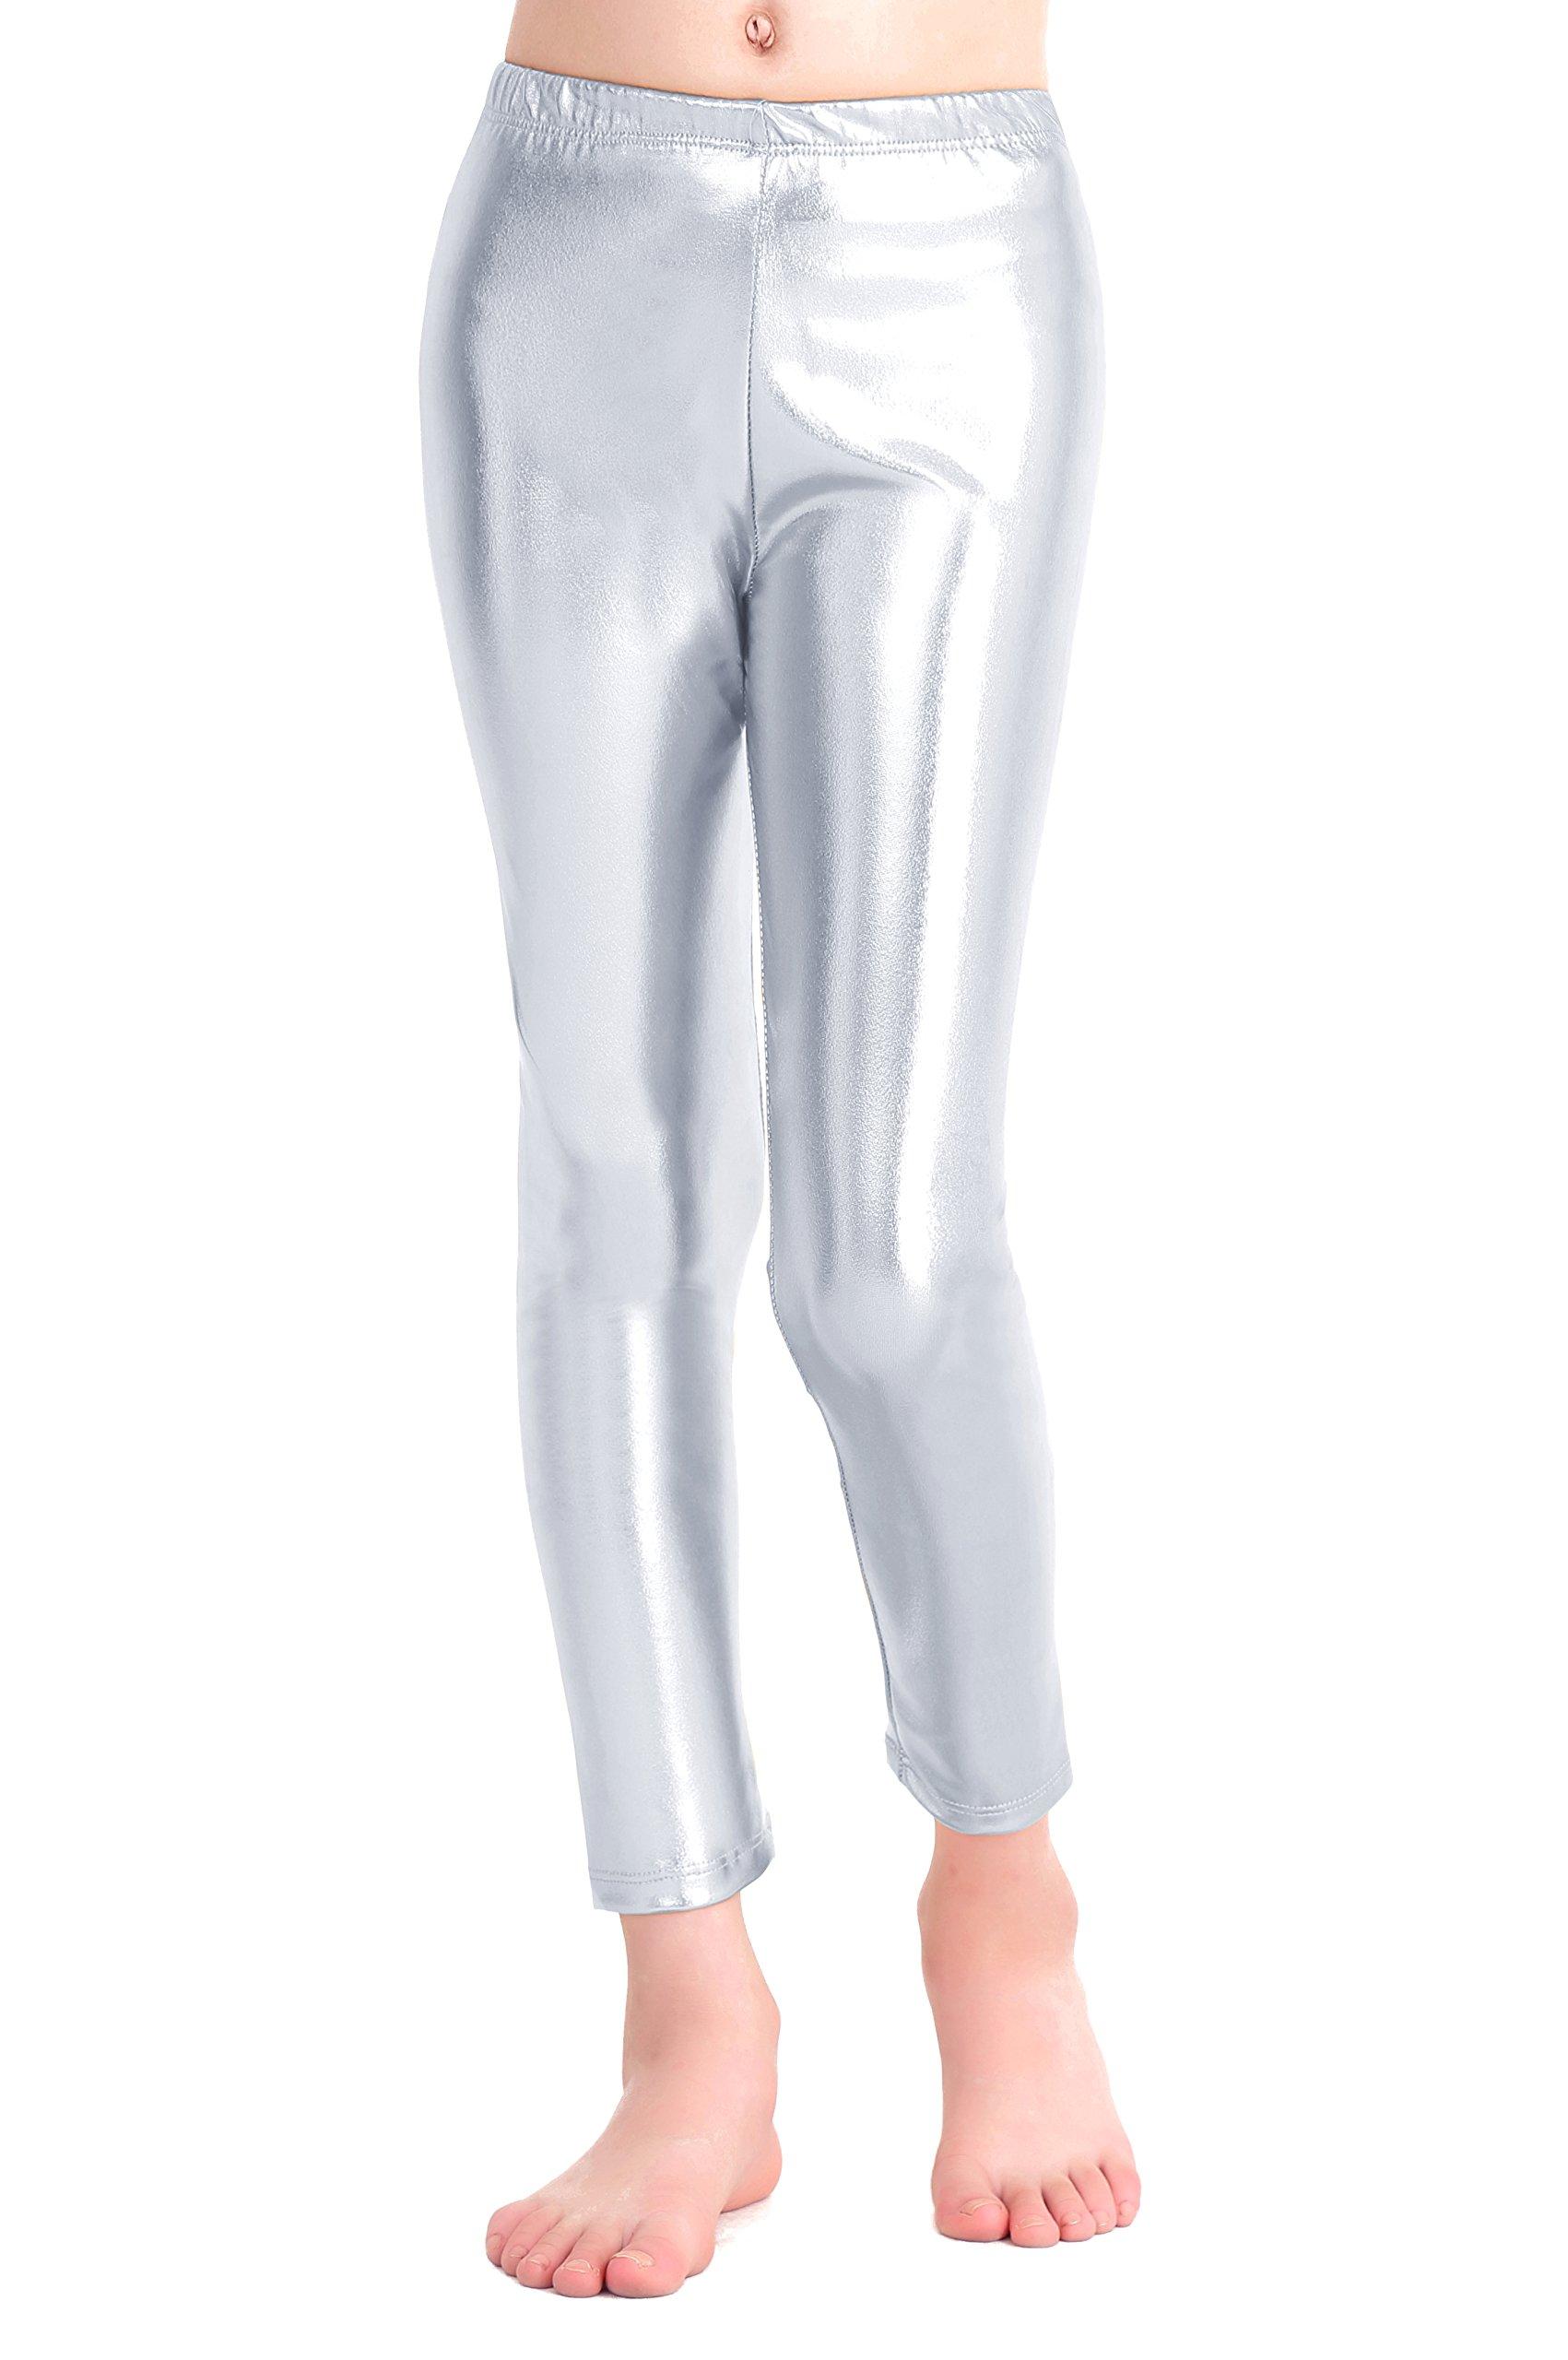 Speerise Girls Kids High Waisted Shiny Metallic Dance Fashion Leggings, Silver, 2-4